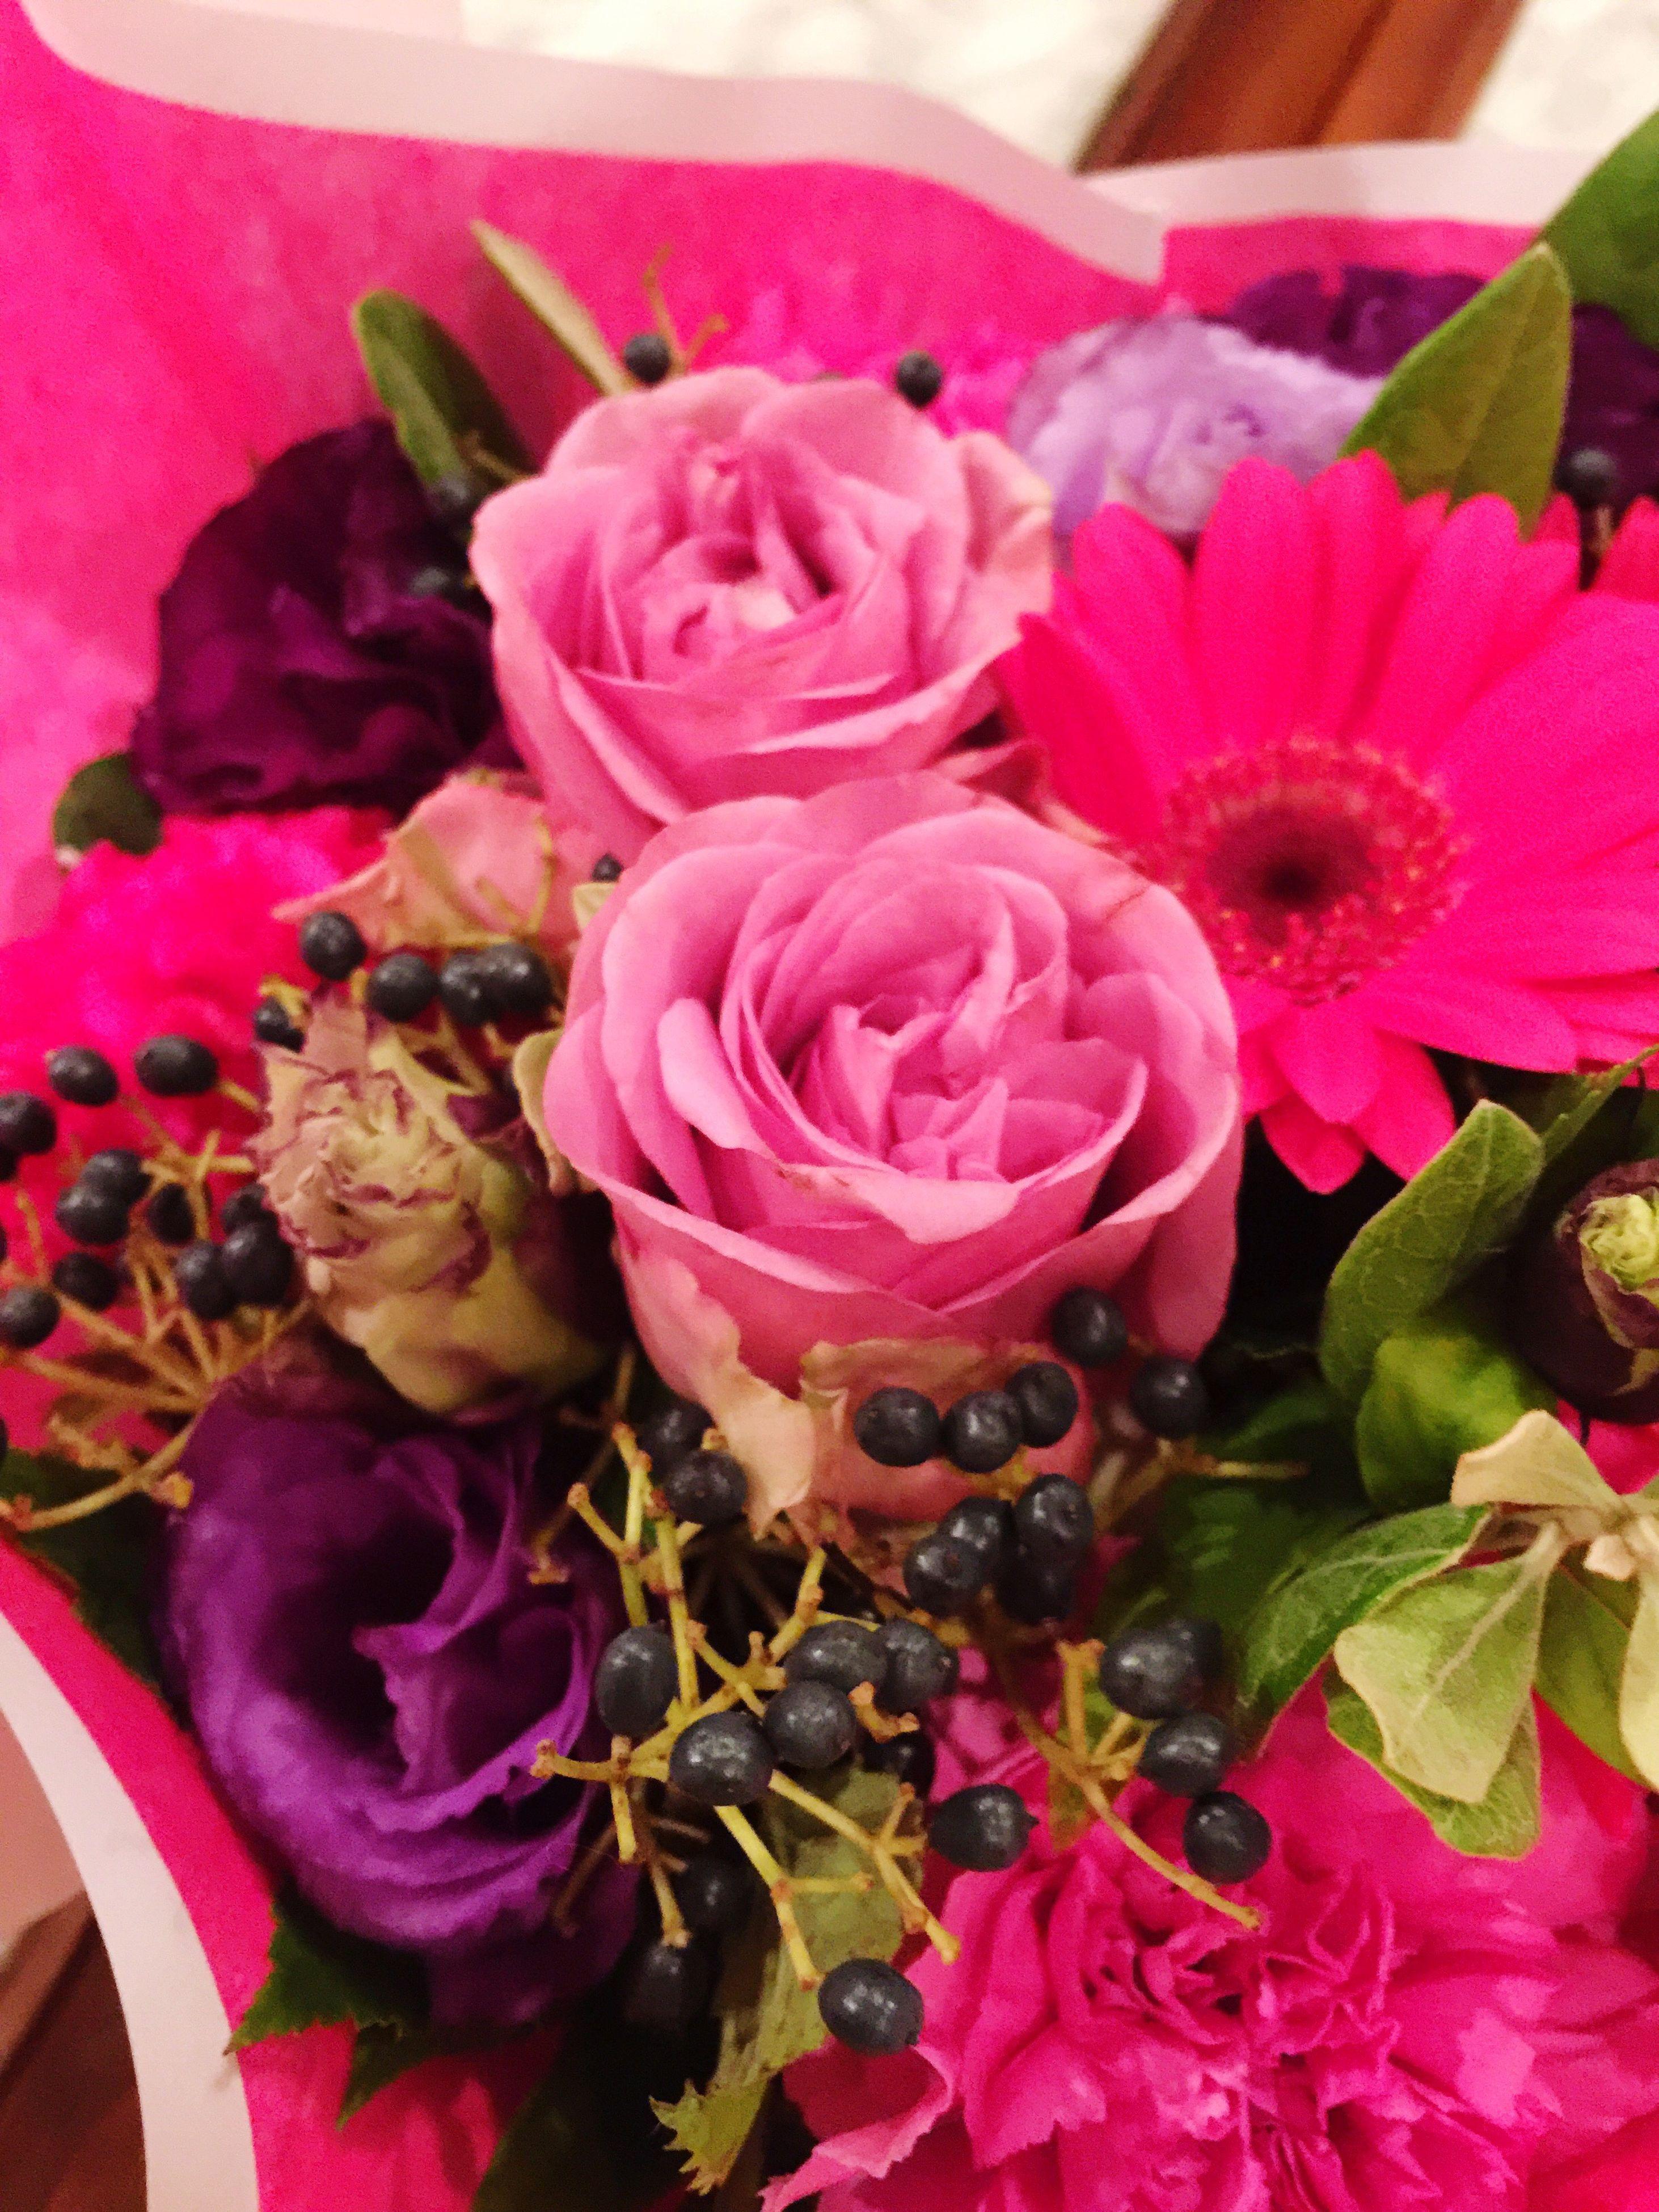 fragility, petal, freshness, flower, flower head, rose - flower, beauty in nature, bouquet, close-up, bunch of flowers, nature, season, blossom, indoors, multi colored, pink color, variation, arrangement, selective focus, softness, in bloom, flower arrangement, springtime, full frame, rose, vibrant color, botany, flower shop